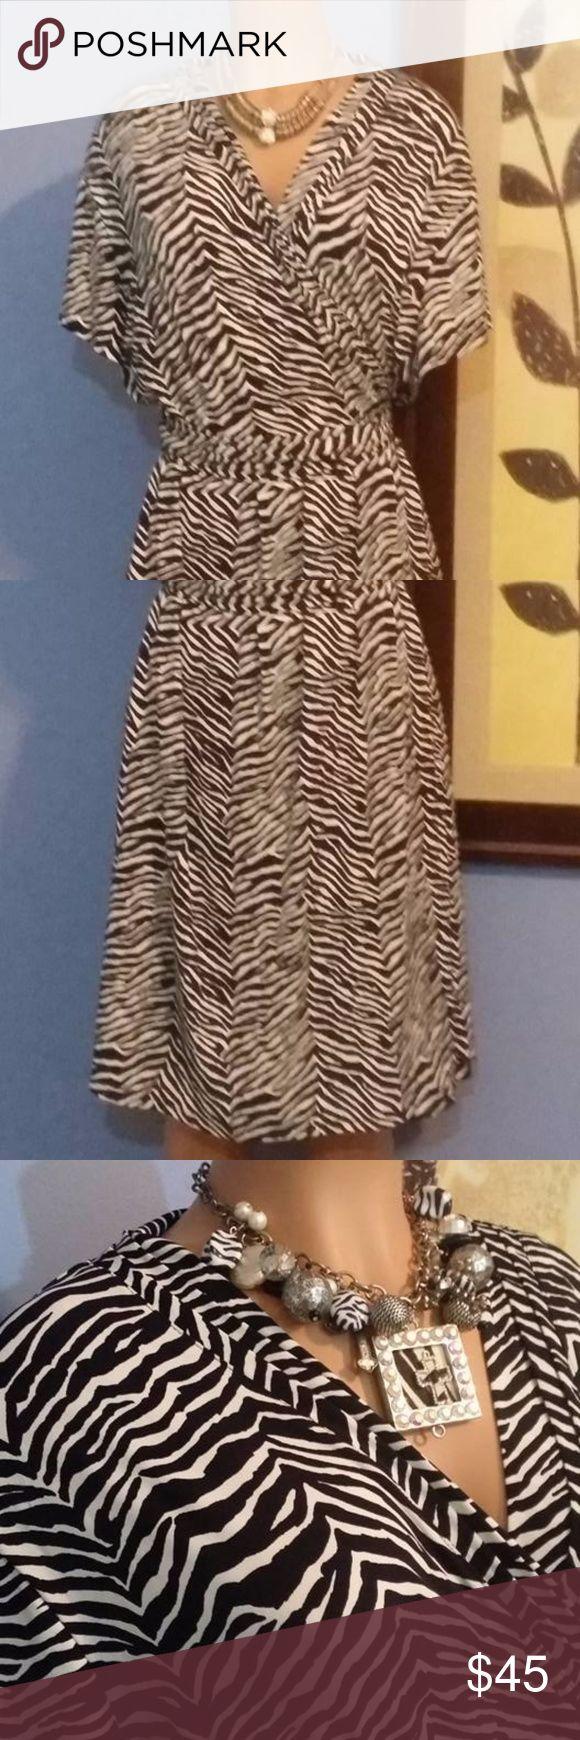 Zebra Print Dress Perfect for the bold and confident curvy chick  Black & White Zebra Print Dress Dresses